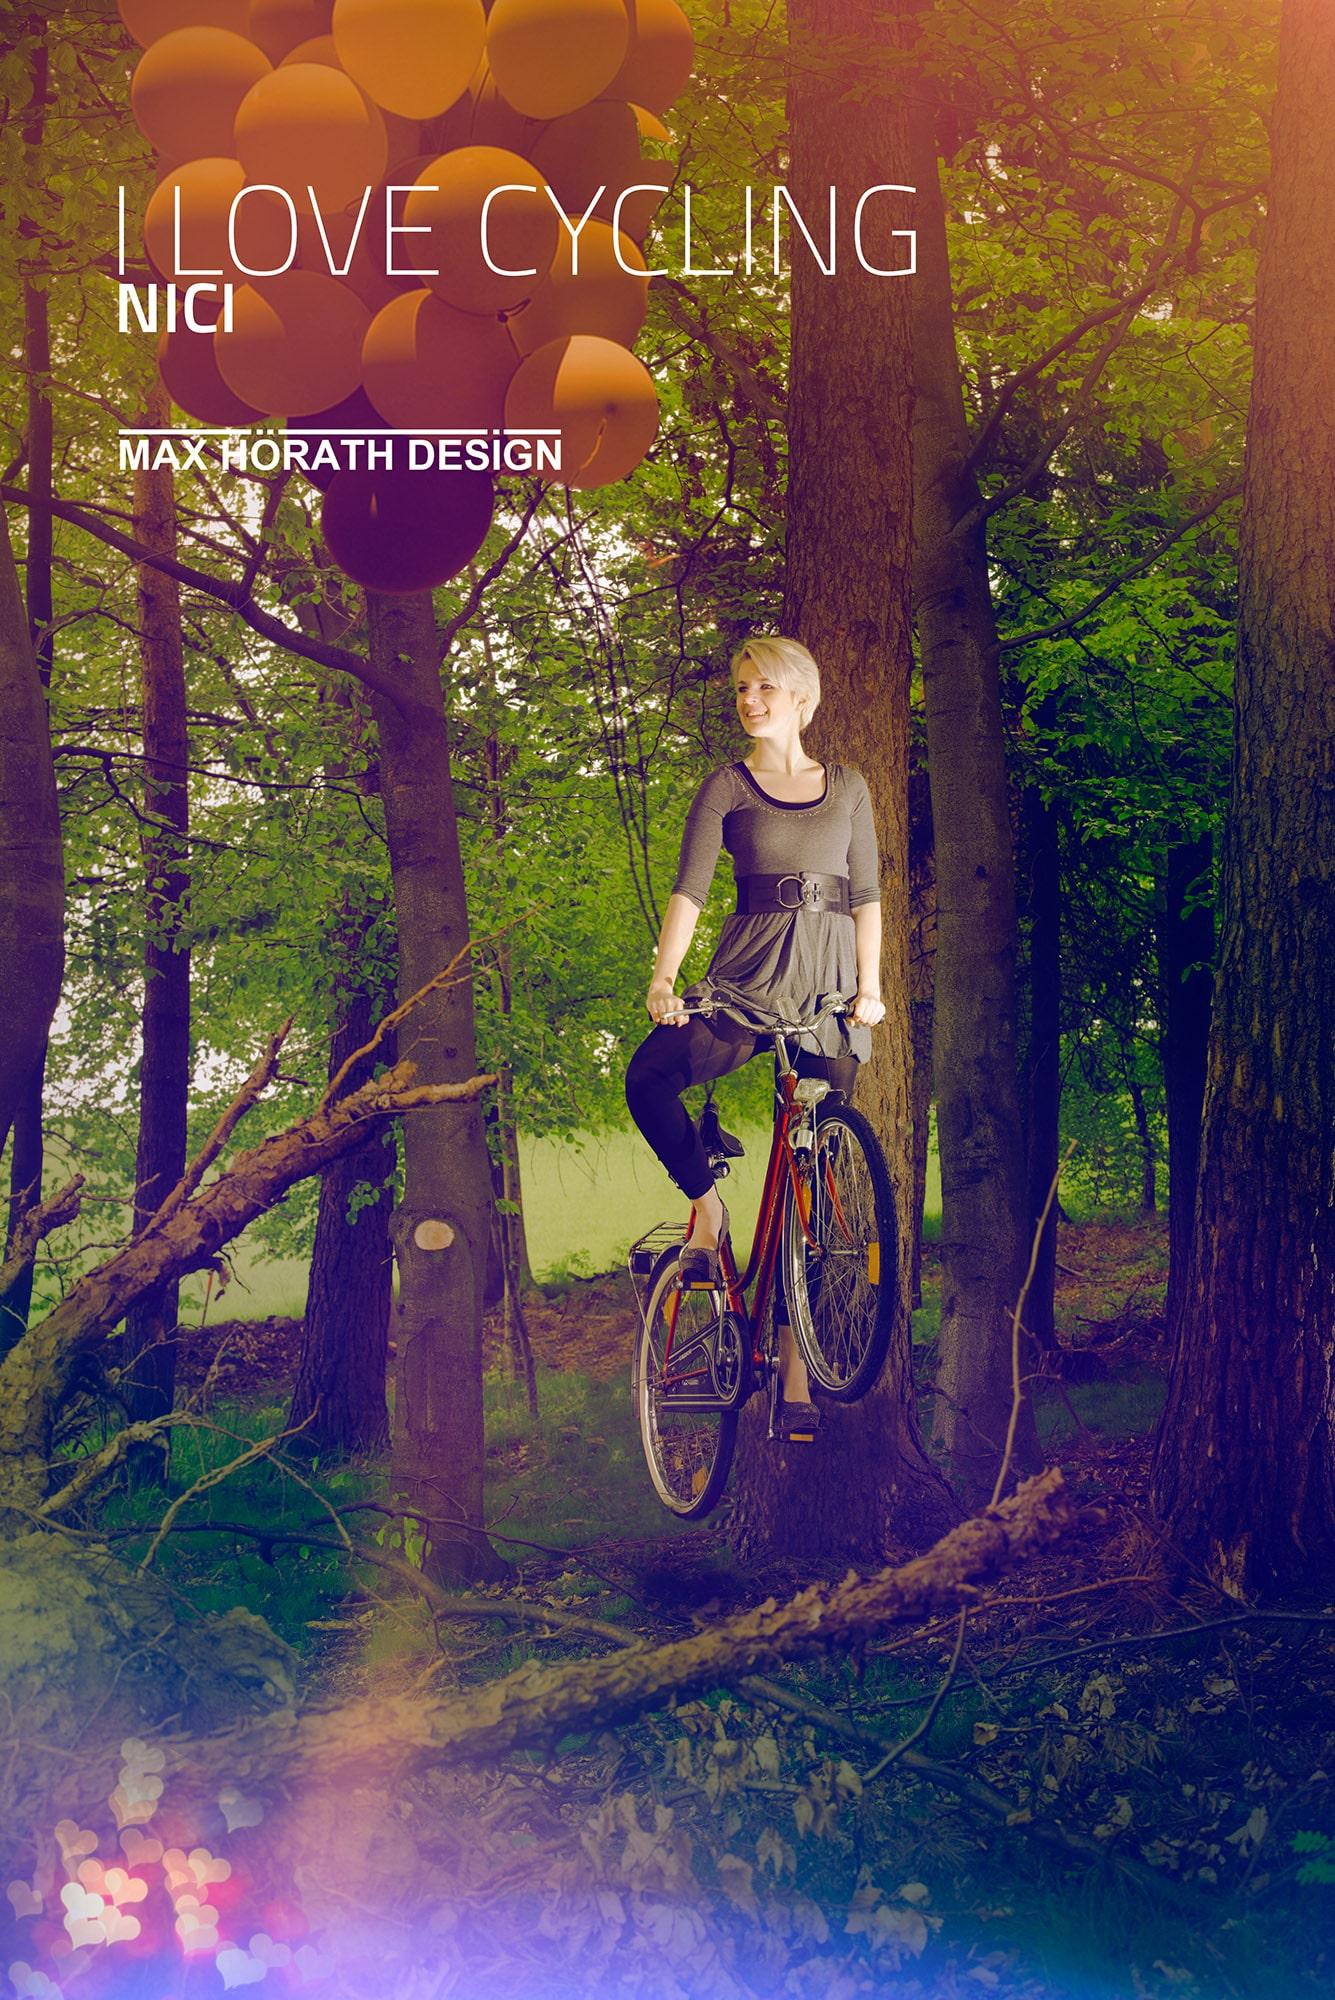 Lavitation-Schwebende-Personen-Editorial-Fotoshooting-Fashion-Fotograf-Max-Hoerath-Design-Kulmbach-Bayreuth-Bamberg-coburg-Fotokurs-Muenchen